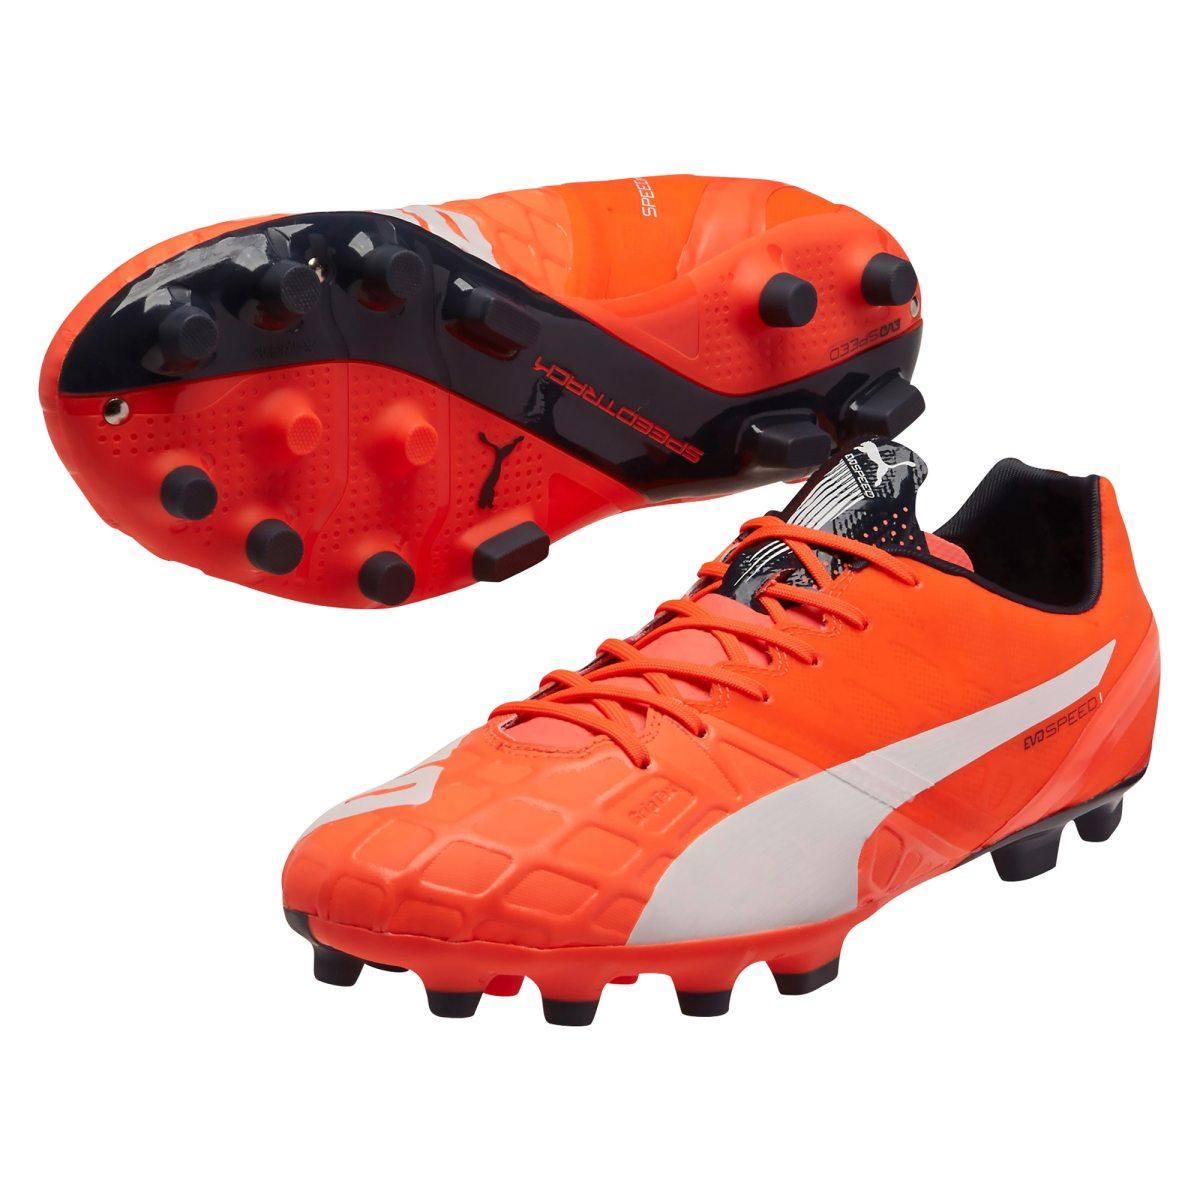 on sale fd4de bf23b puma evospeed 1.4 ag fotbollssko senior fotbollsskor